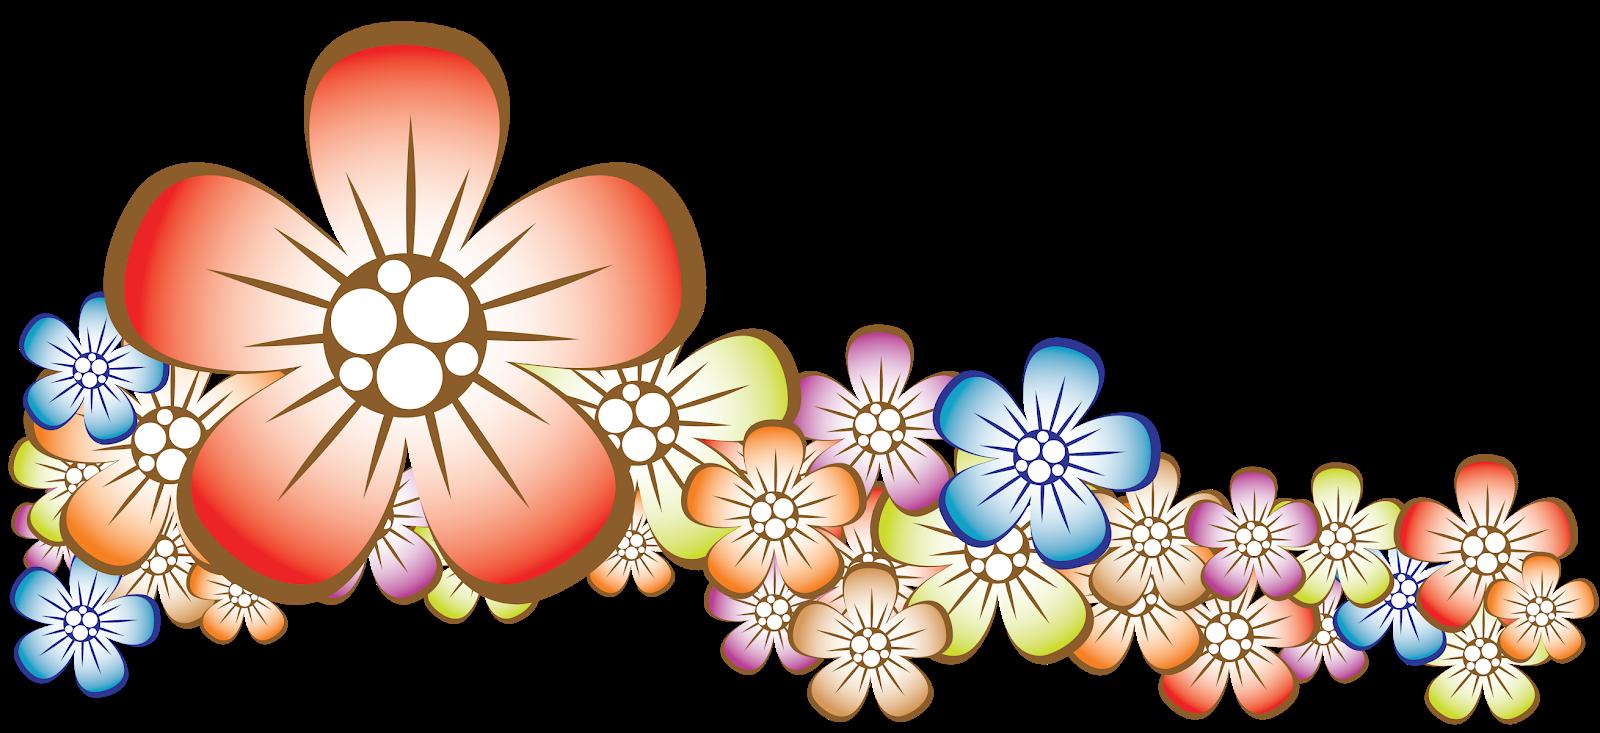 кольцо картинка цветка на прозрачном фоне для презентации жертв киллерши стал